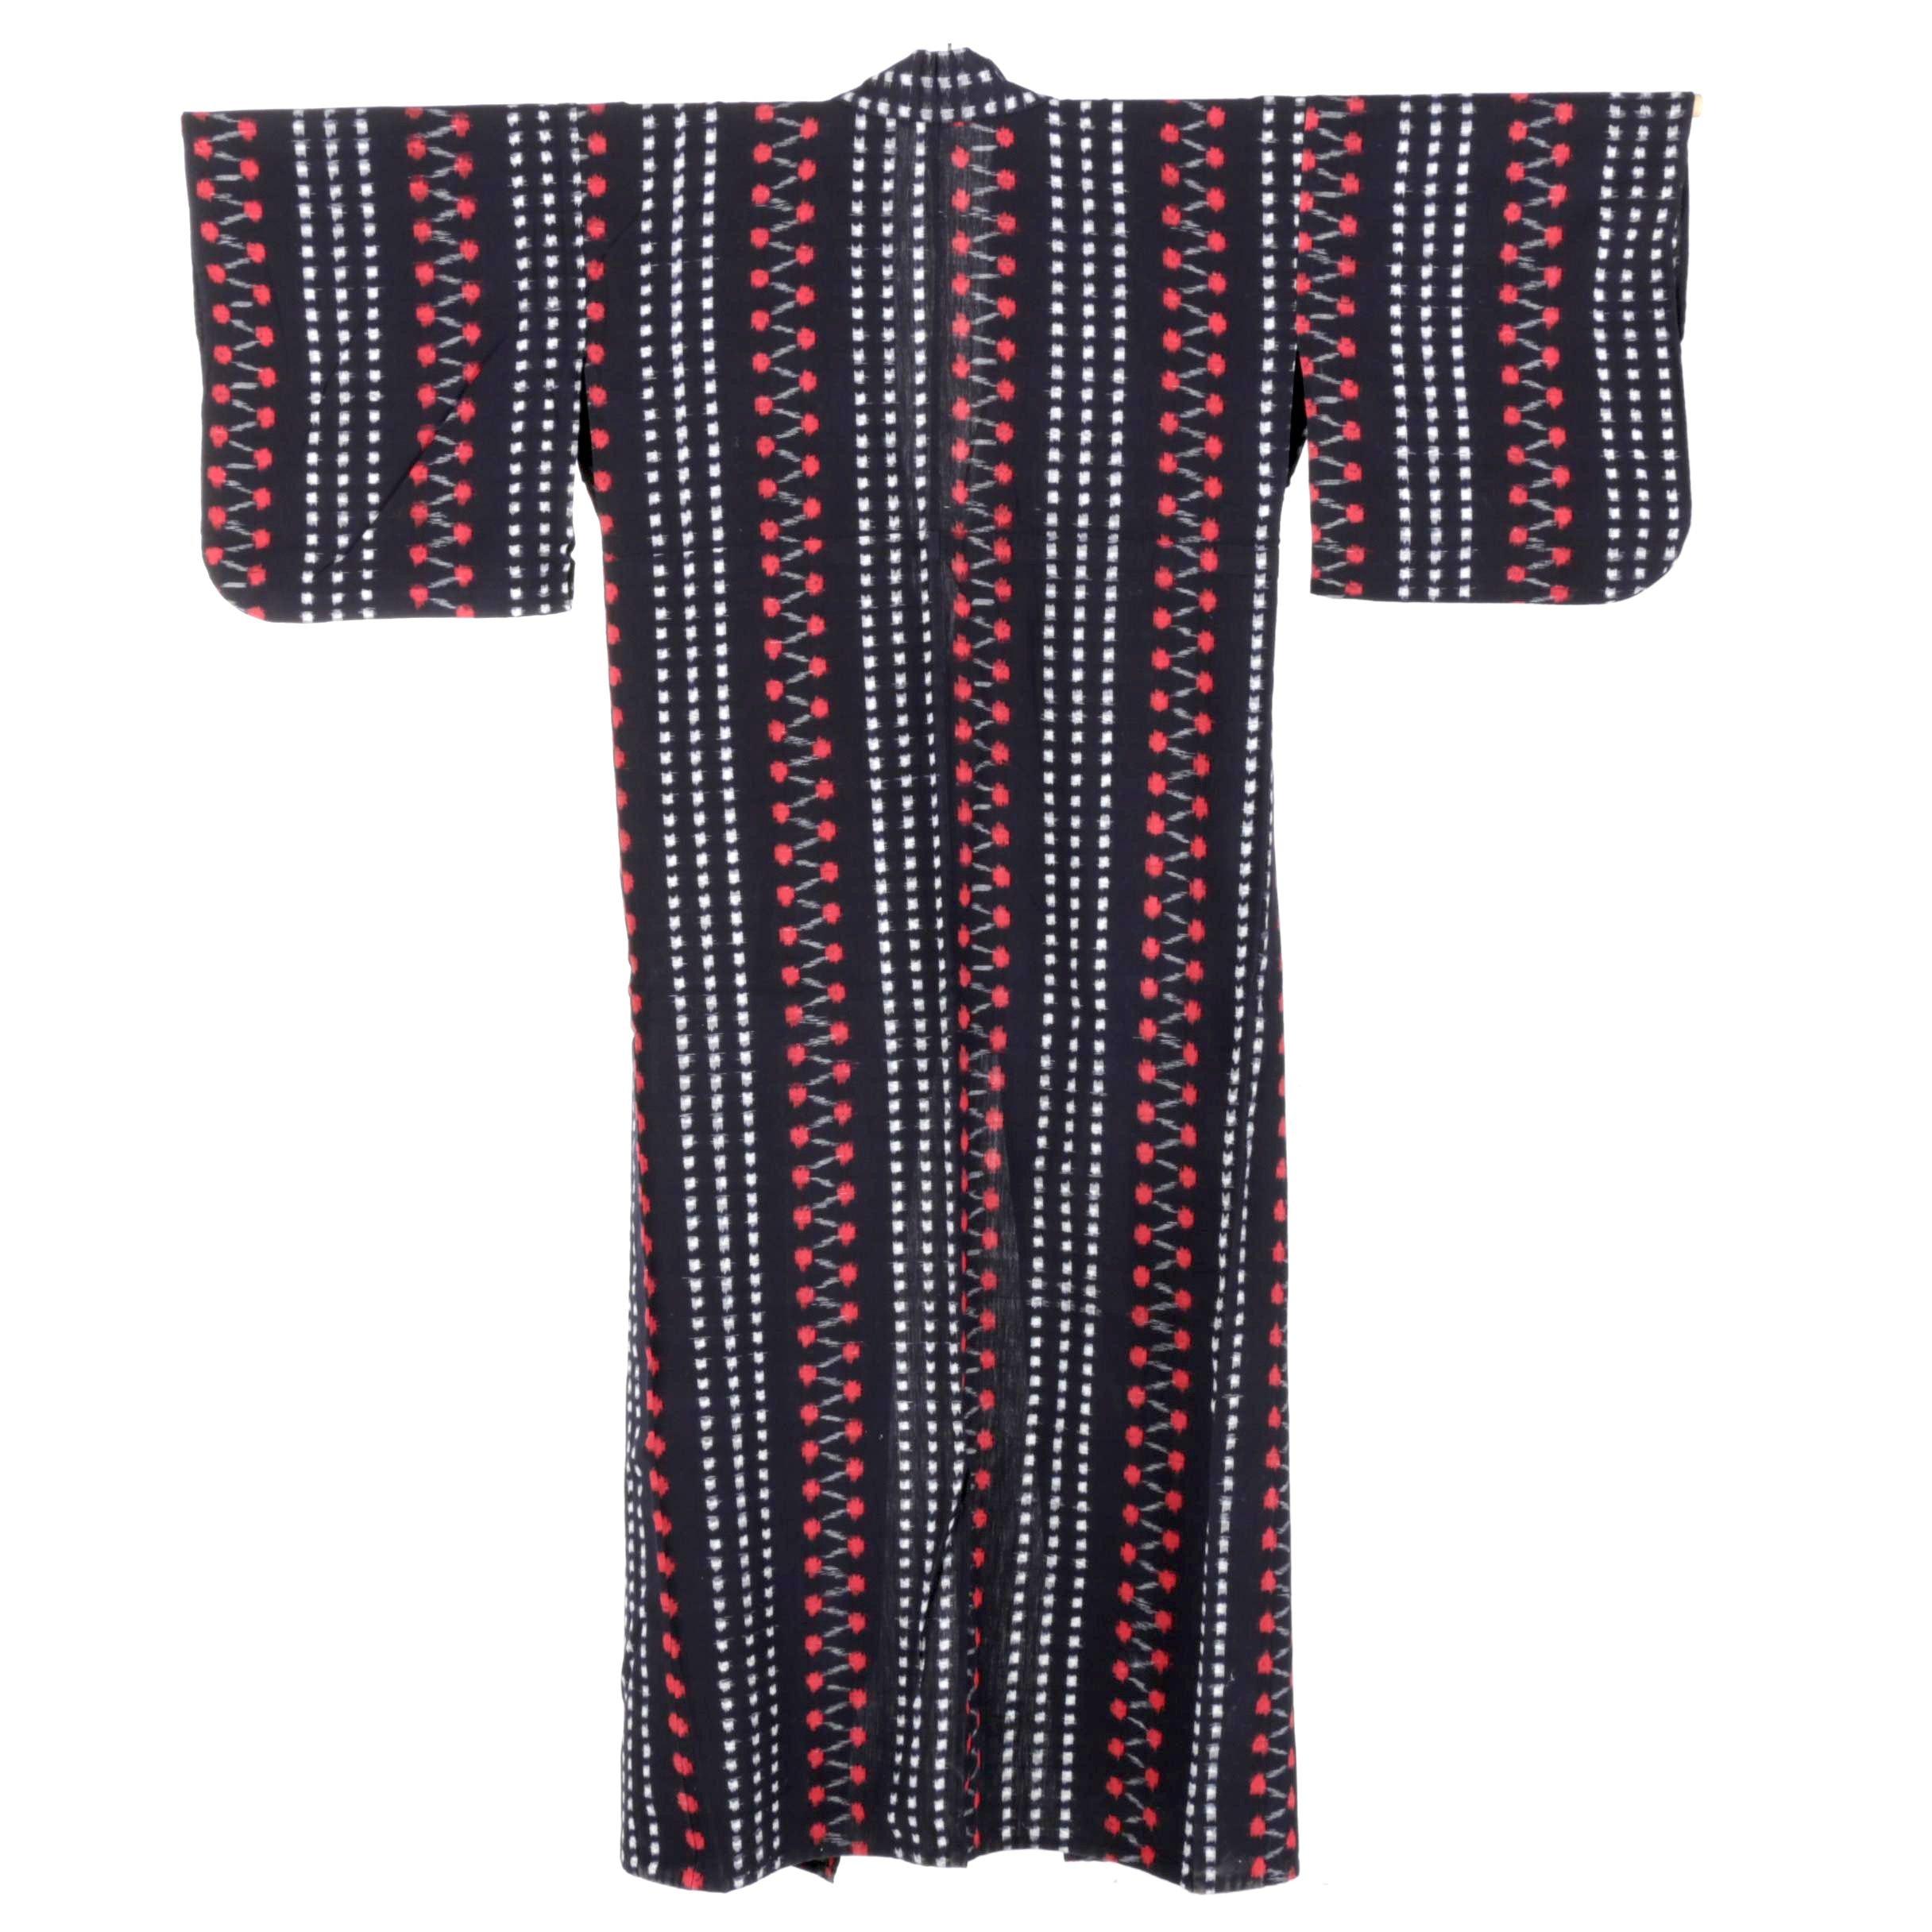 Circa 1950s Vintage Cotton Kimono